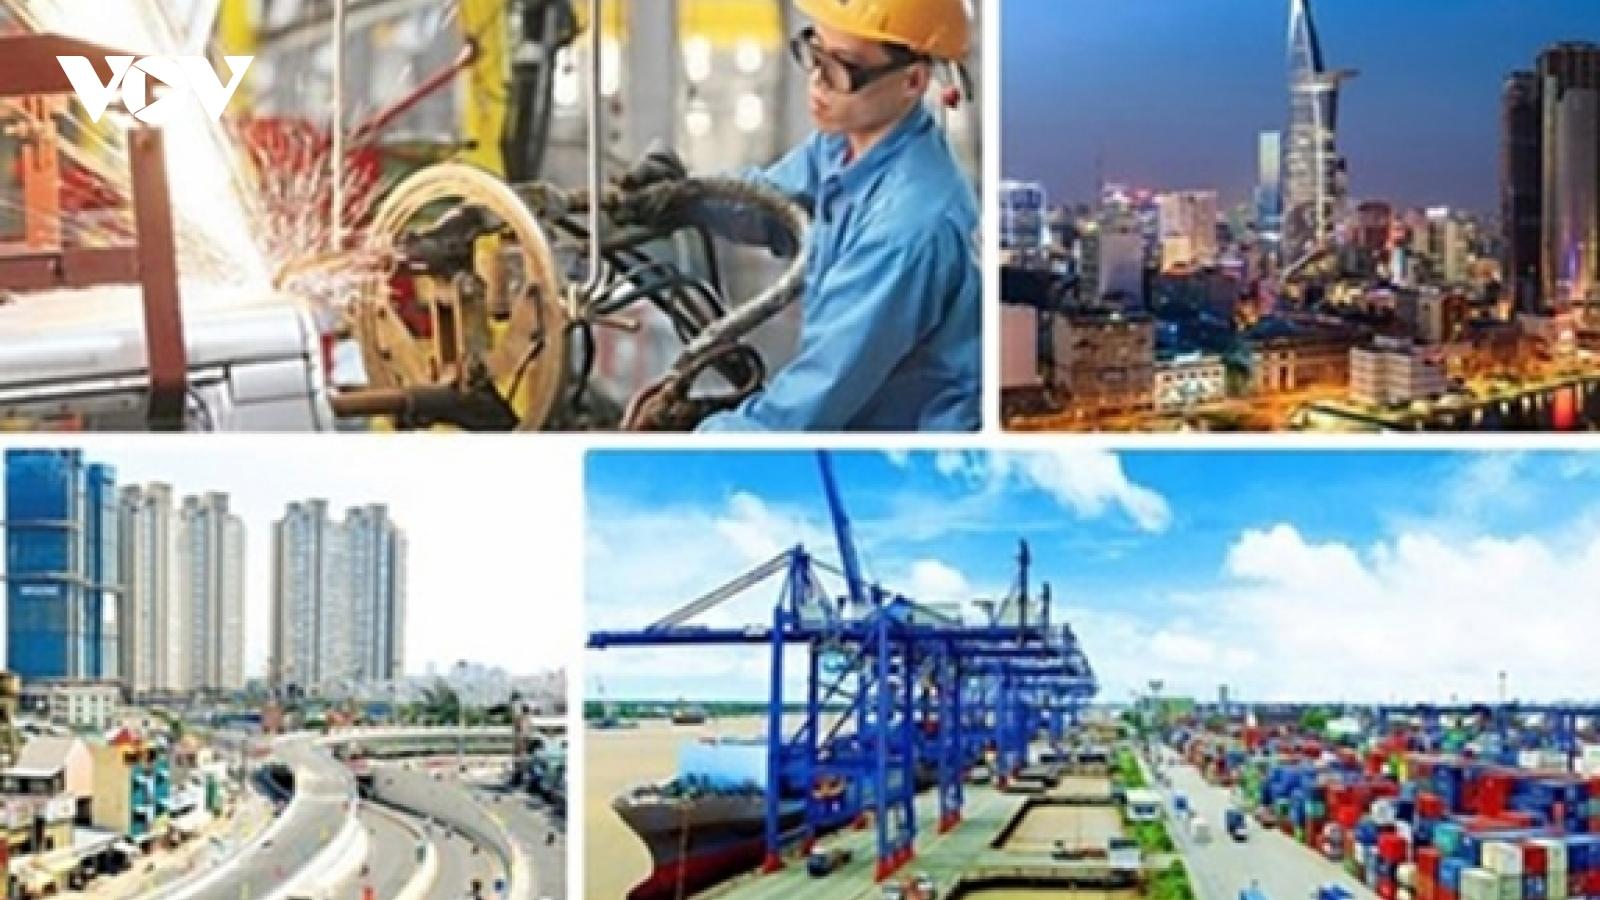 Bangkok Post notes Vietnam as investment destination despite COVID-19